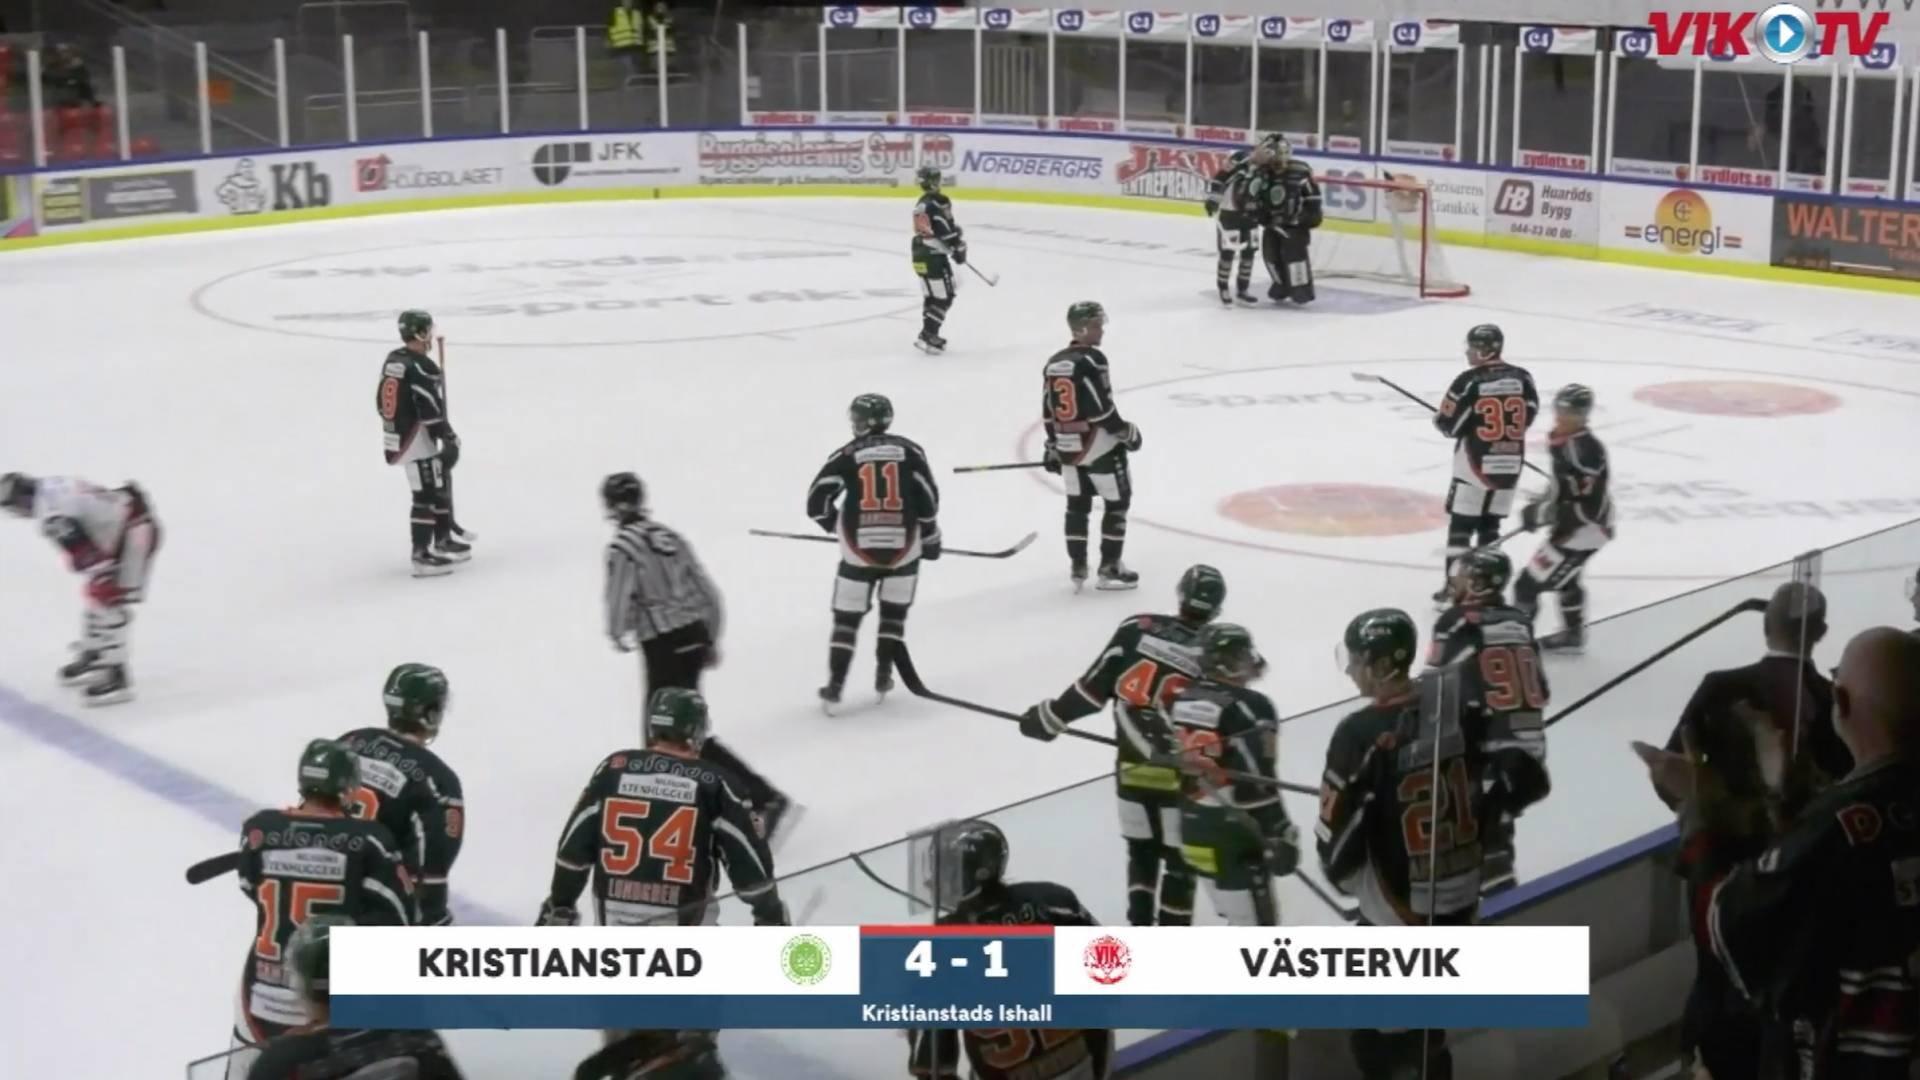 VIK-TV: Highlights Kristianstad-VIK 4-1